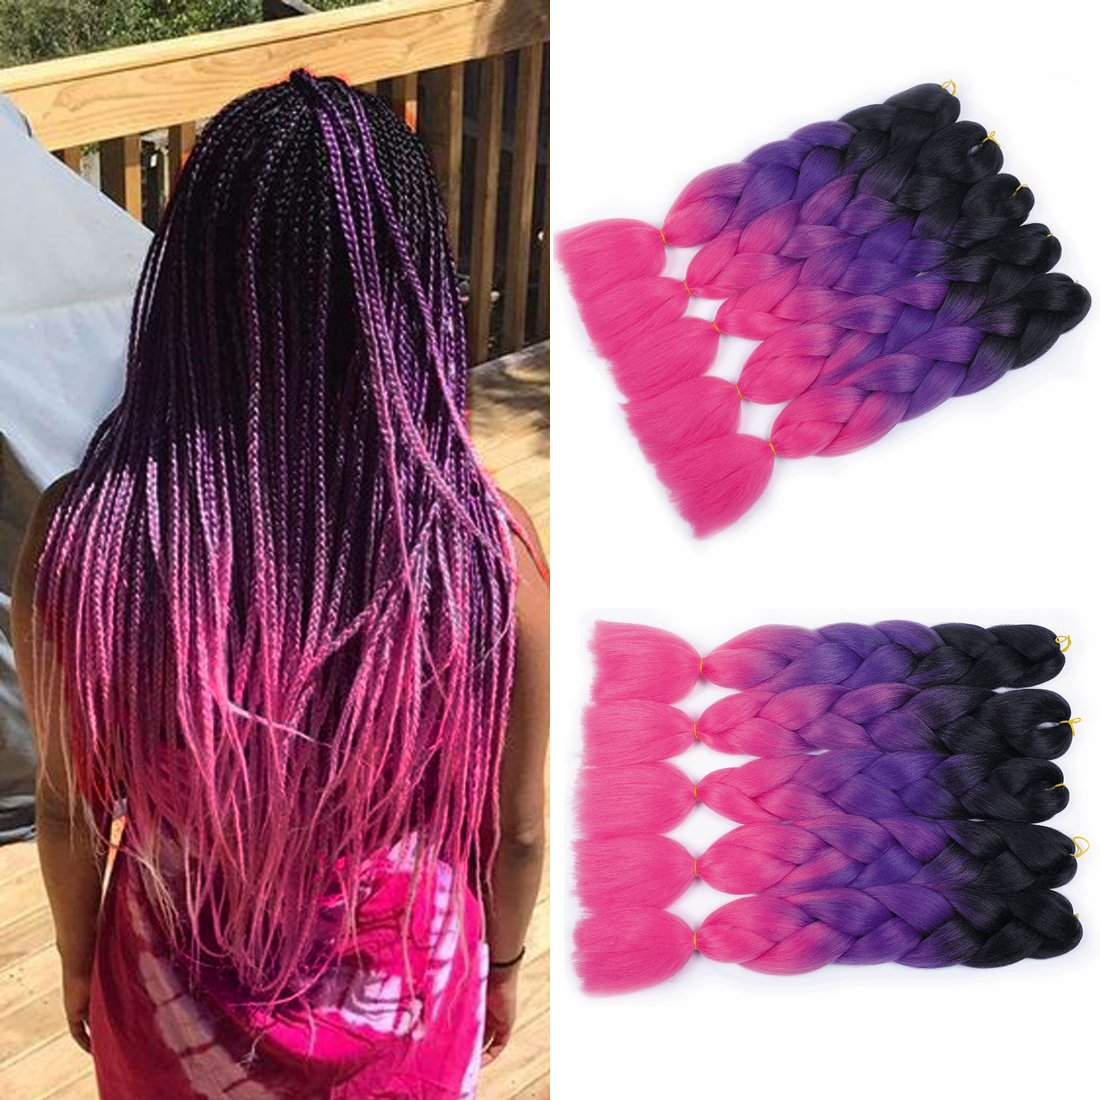 MSHAIR Ombre Jumbo Braiding Hair Extension Synthetic Kanekalon Fiber for Twist Braiding Hair Black/Purple/Hot Pink Color 24 Inch 5 Pieces/lot